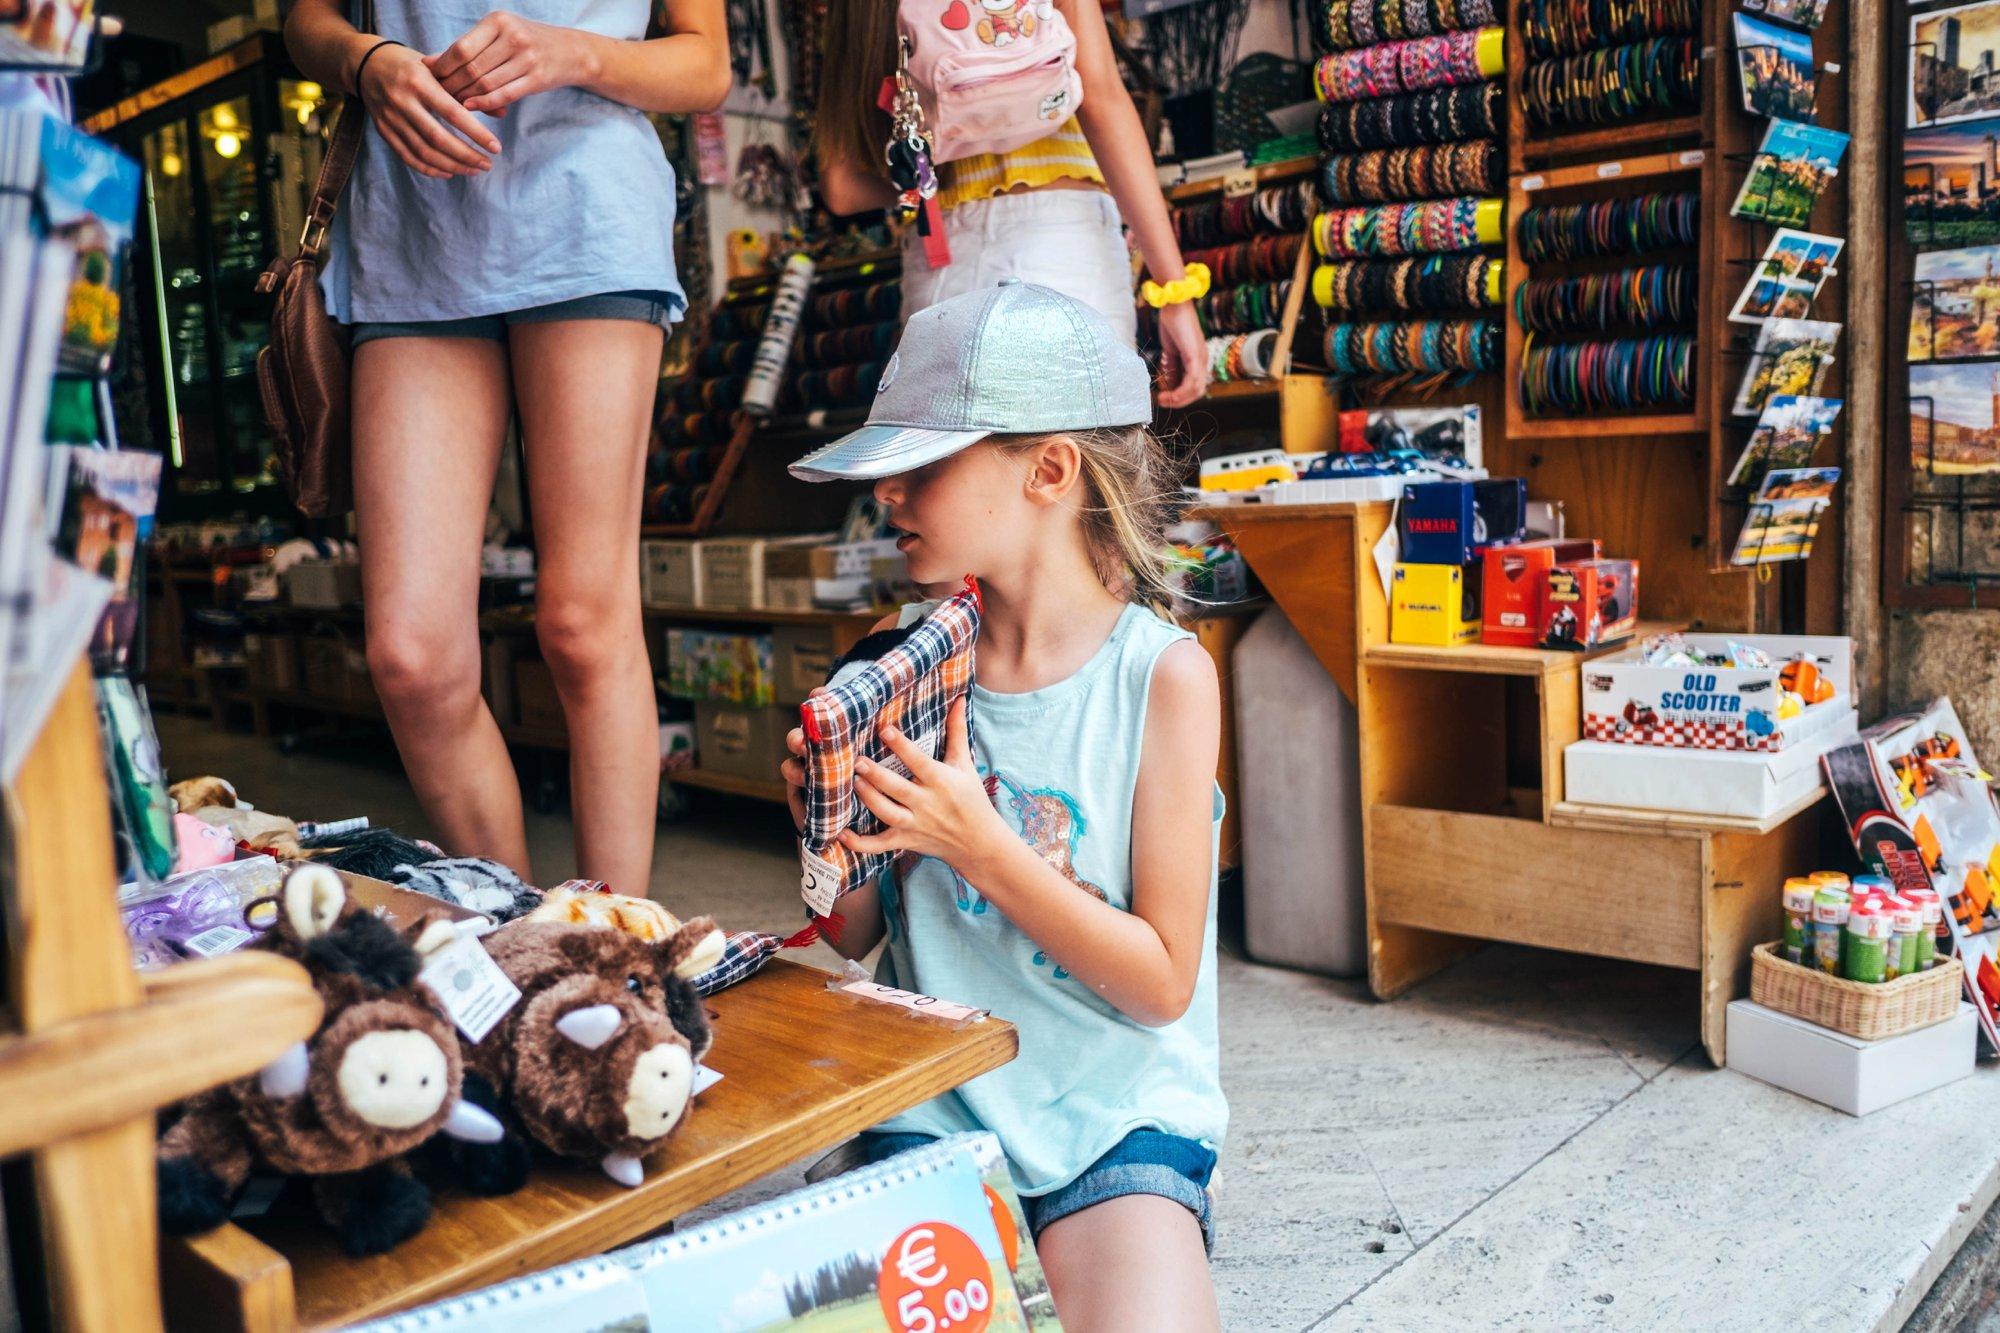 Little girl in shop St Gimignano Tuscany Essex Documentary Wedding Travel photographer